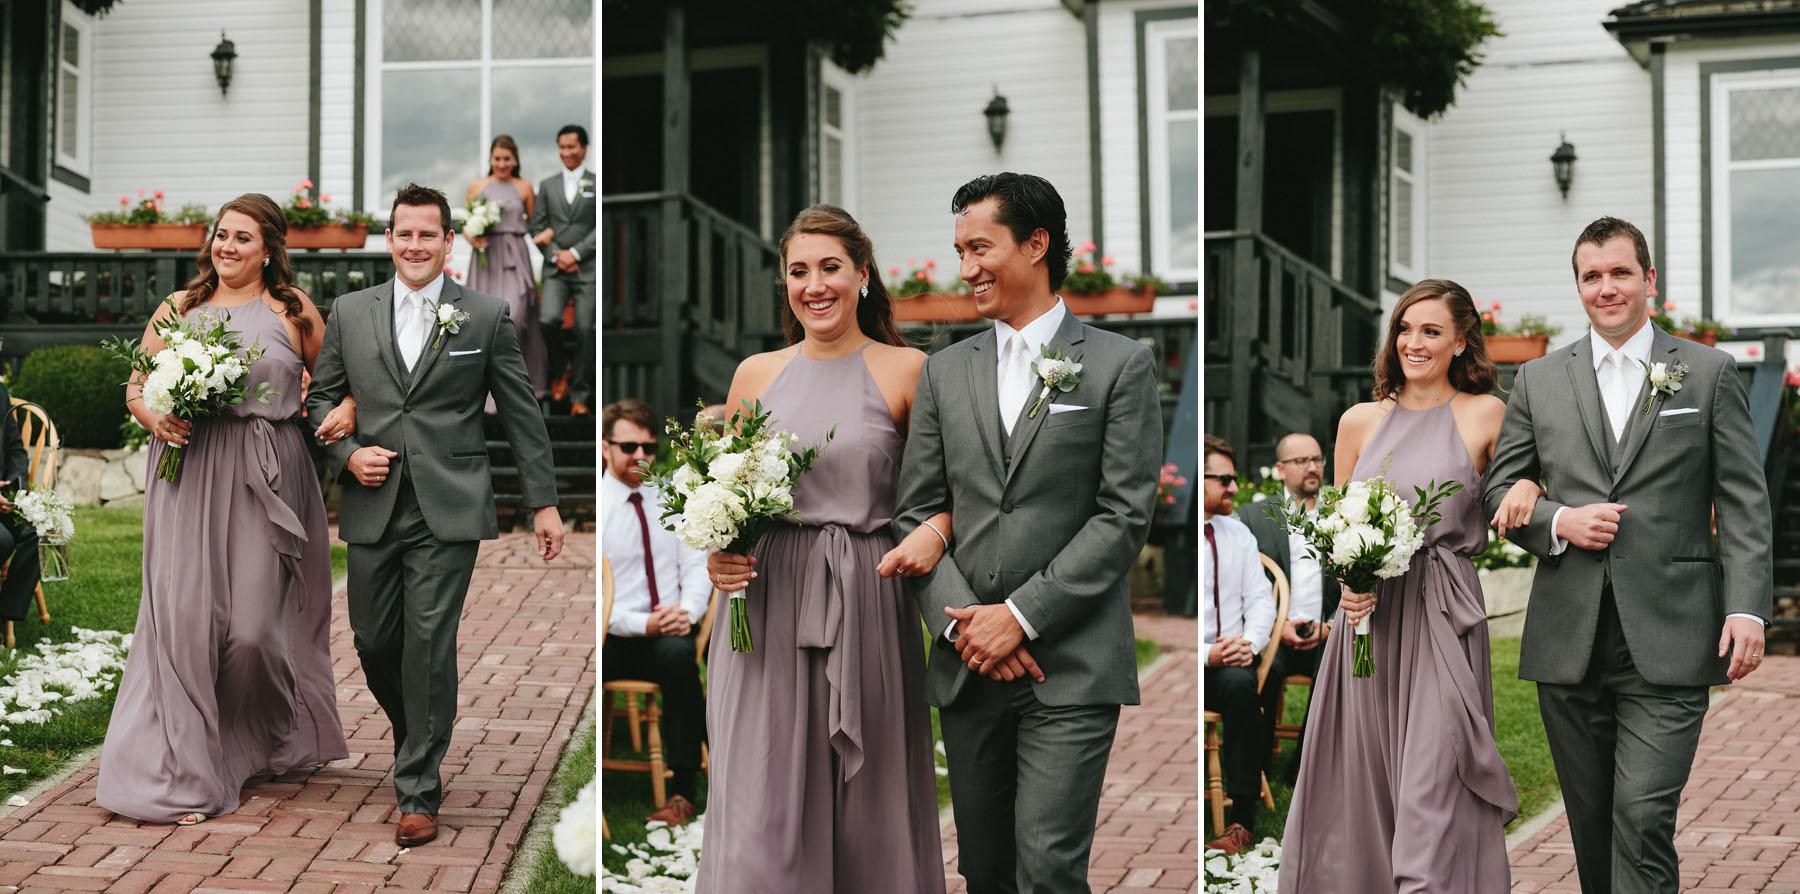 thetis-island-wedding-photographer-rp-rn-068.jpg